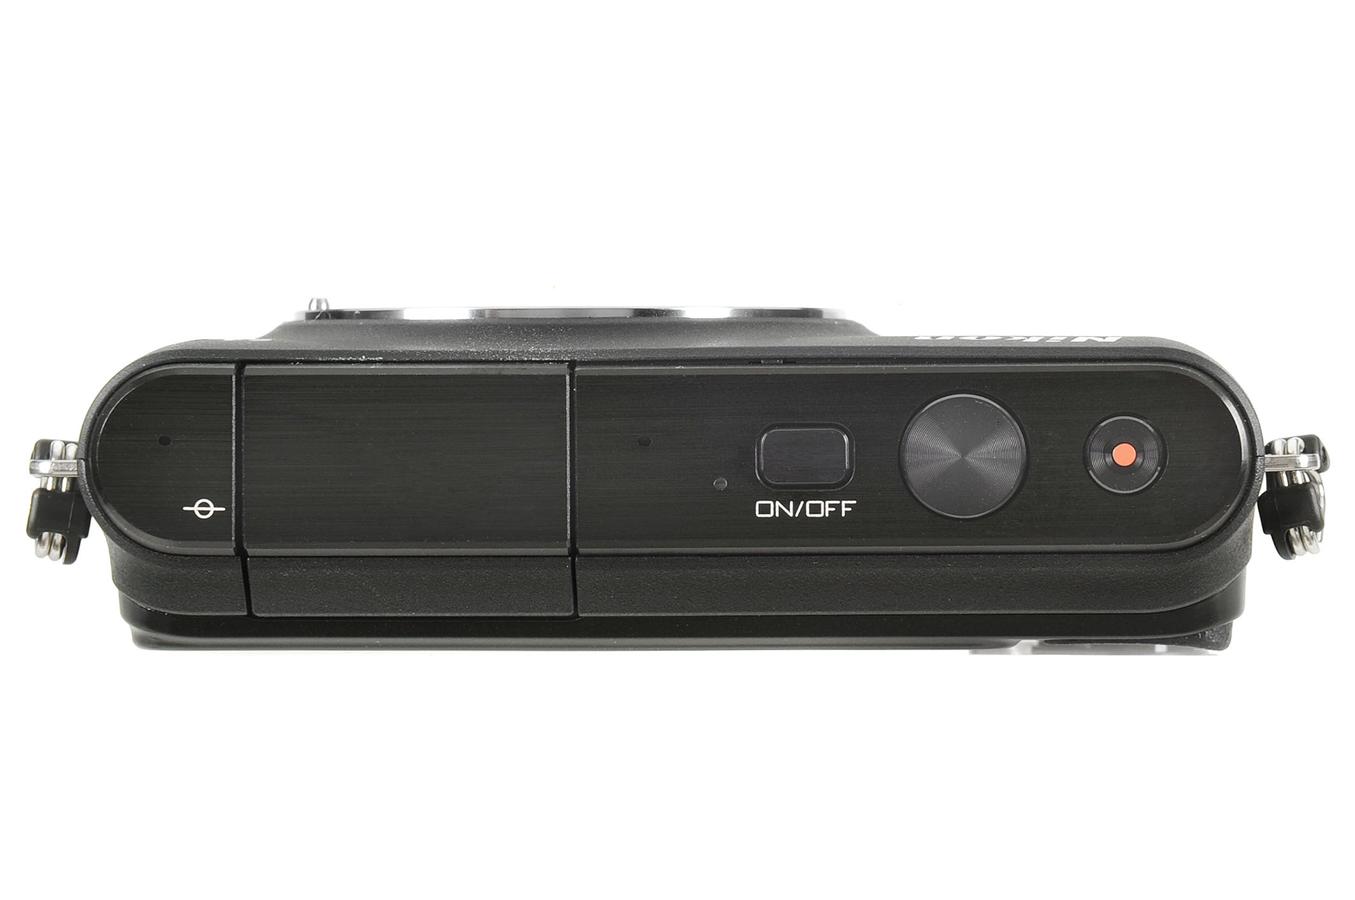 appareil photo hybride nikon s1 11 27 5 30 110vr housse 8 go 3725170 darty